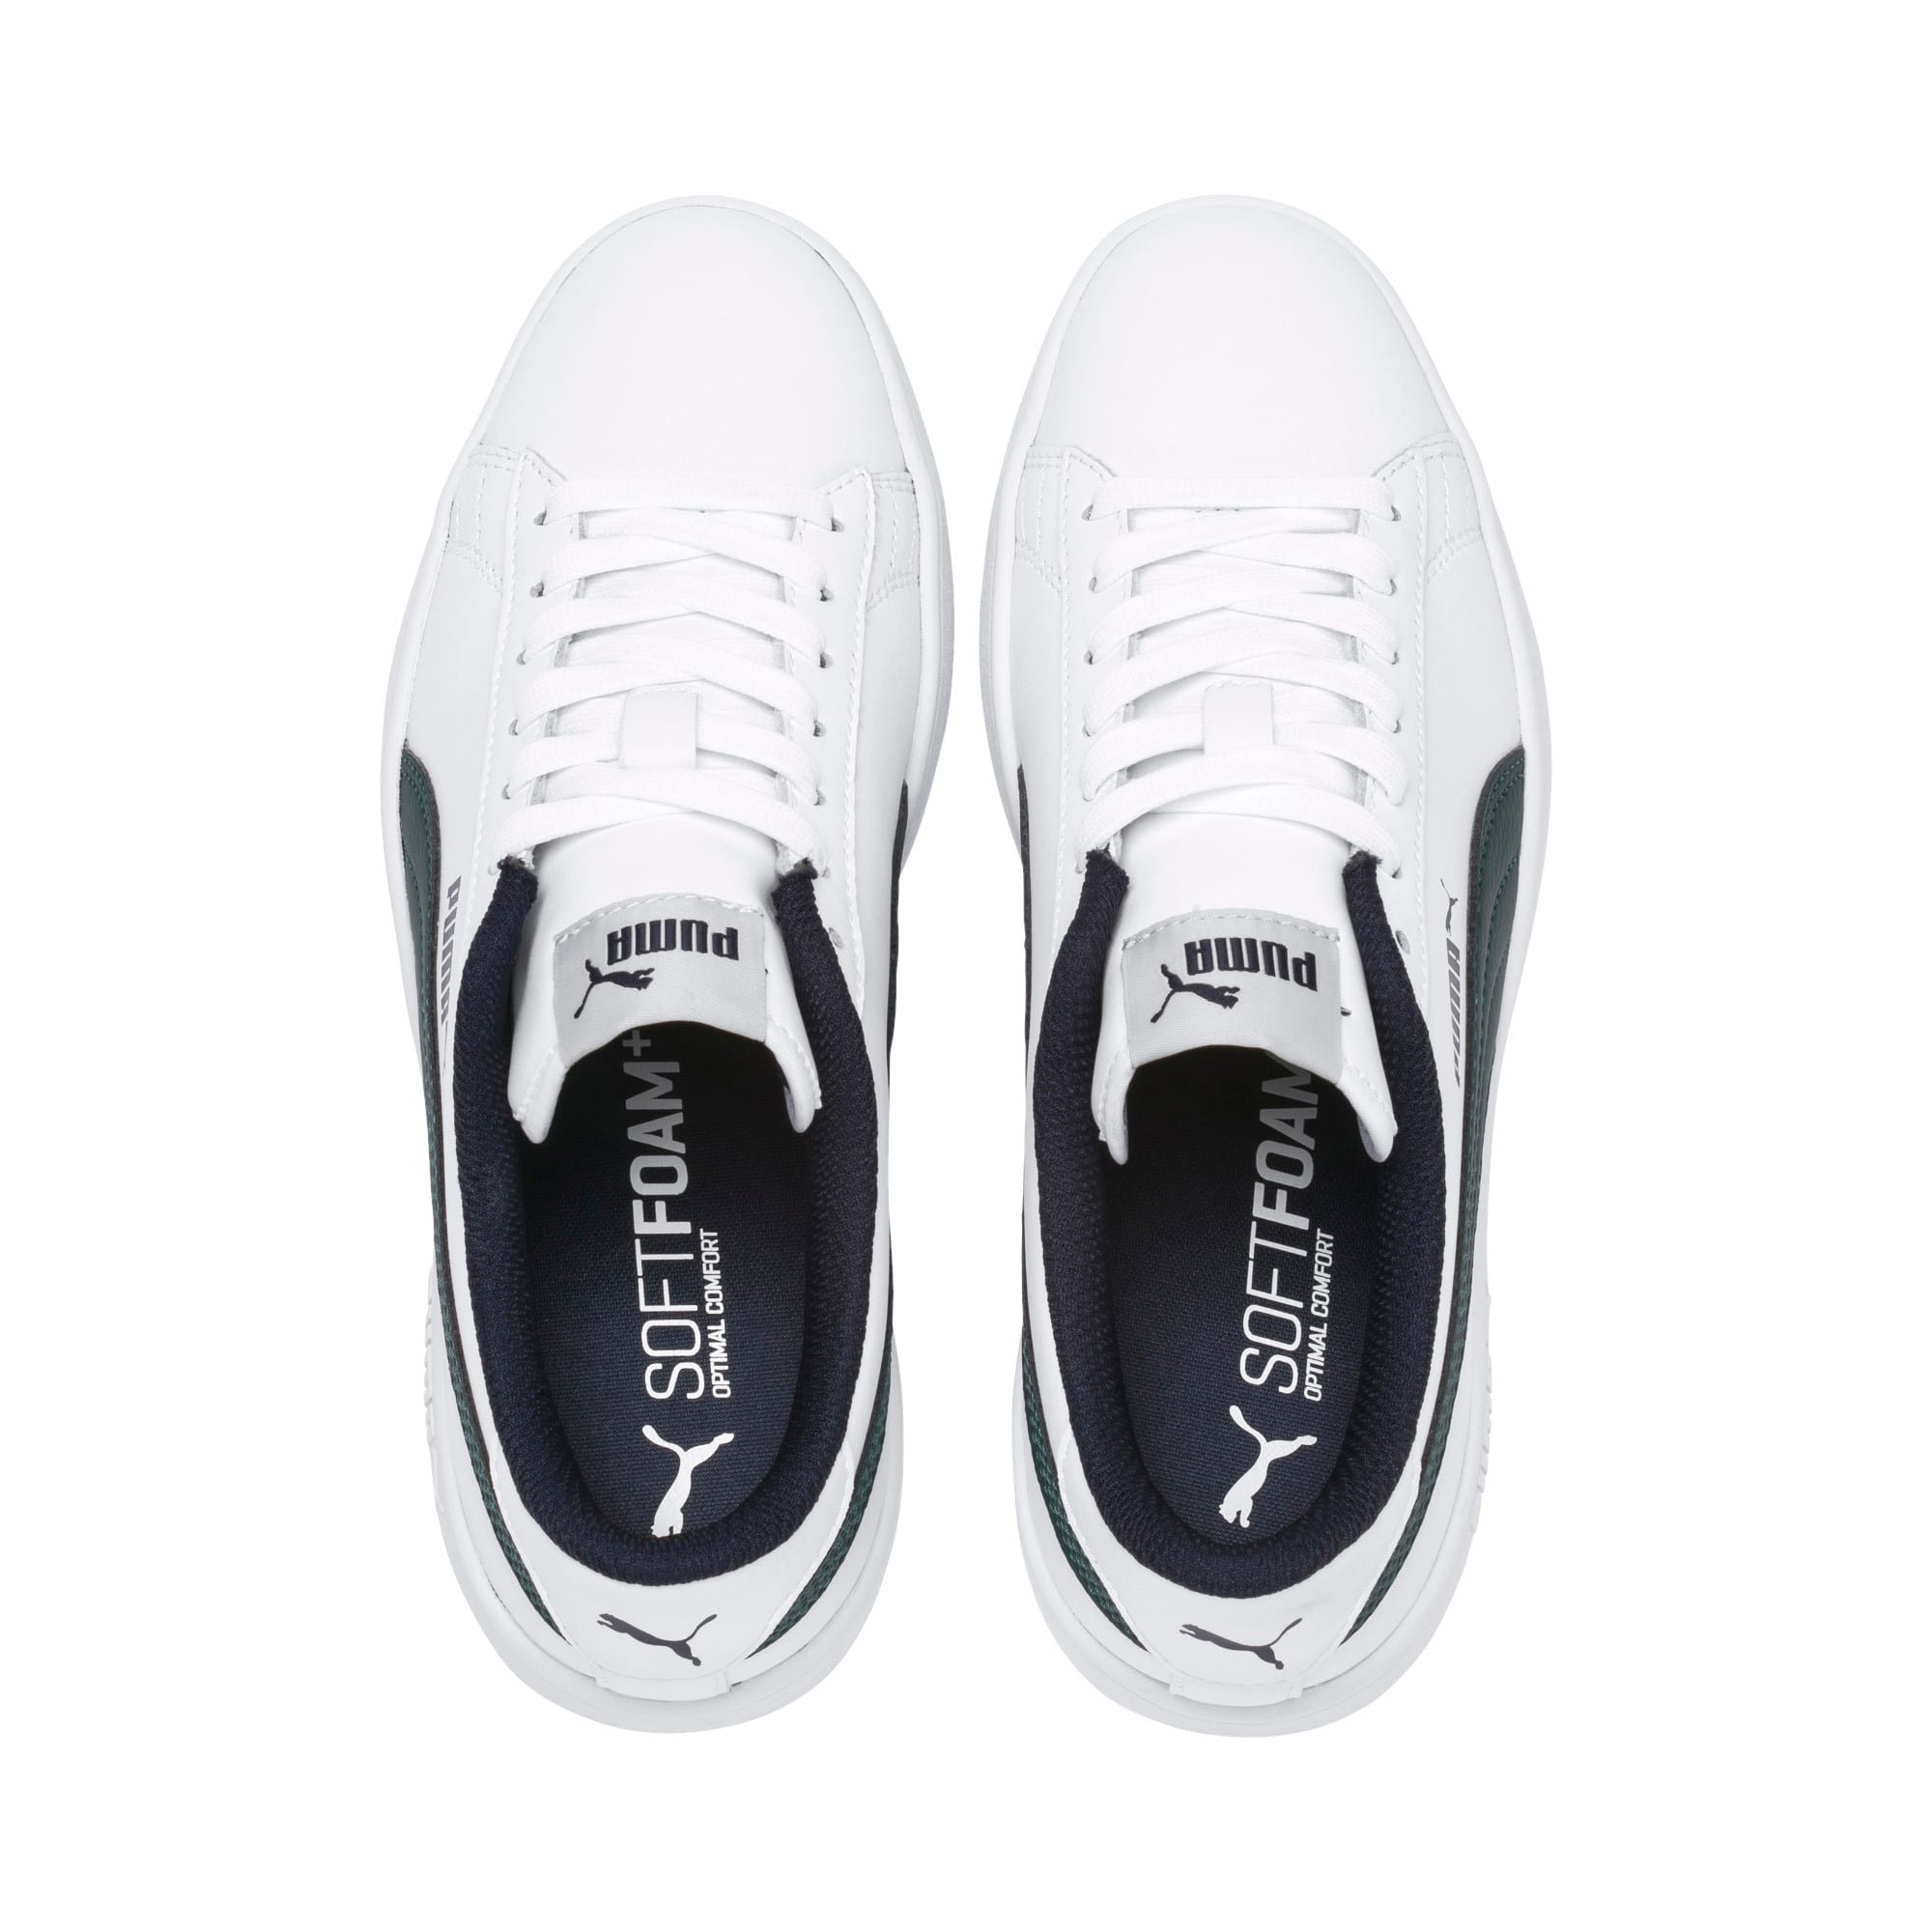 Thumbnail 6 of PUMA Smash v2 Youth Sneaker, Puma White-Ponderosa Pine, medium